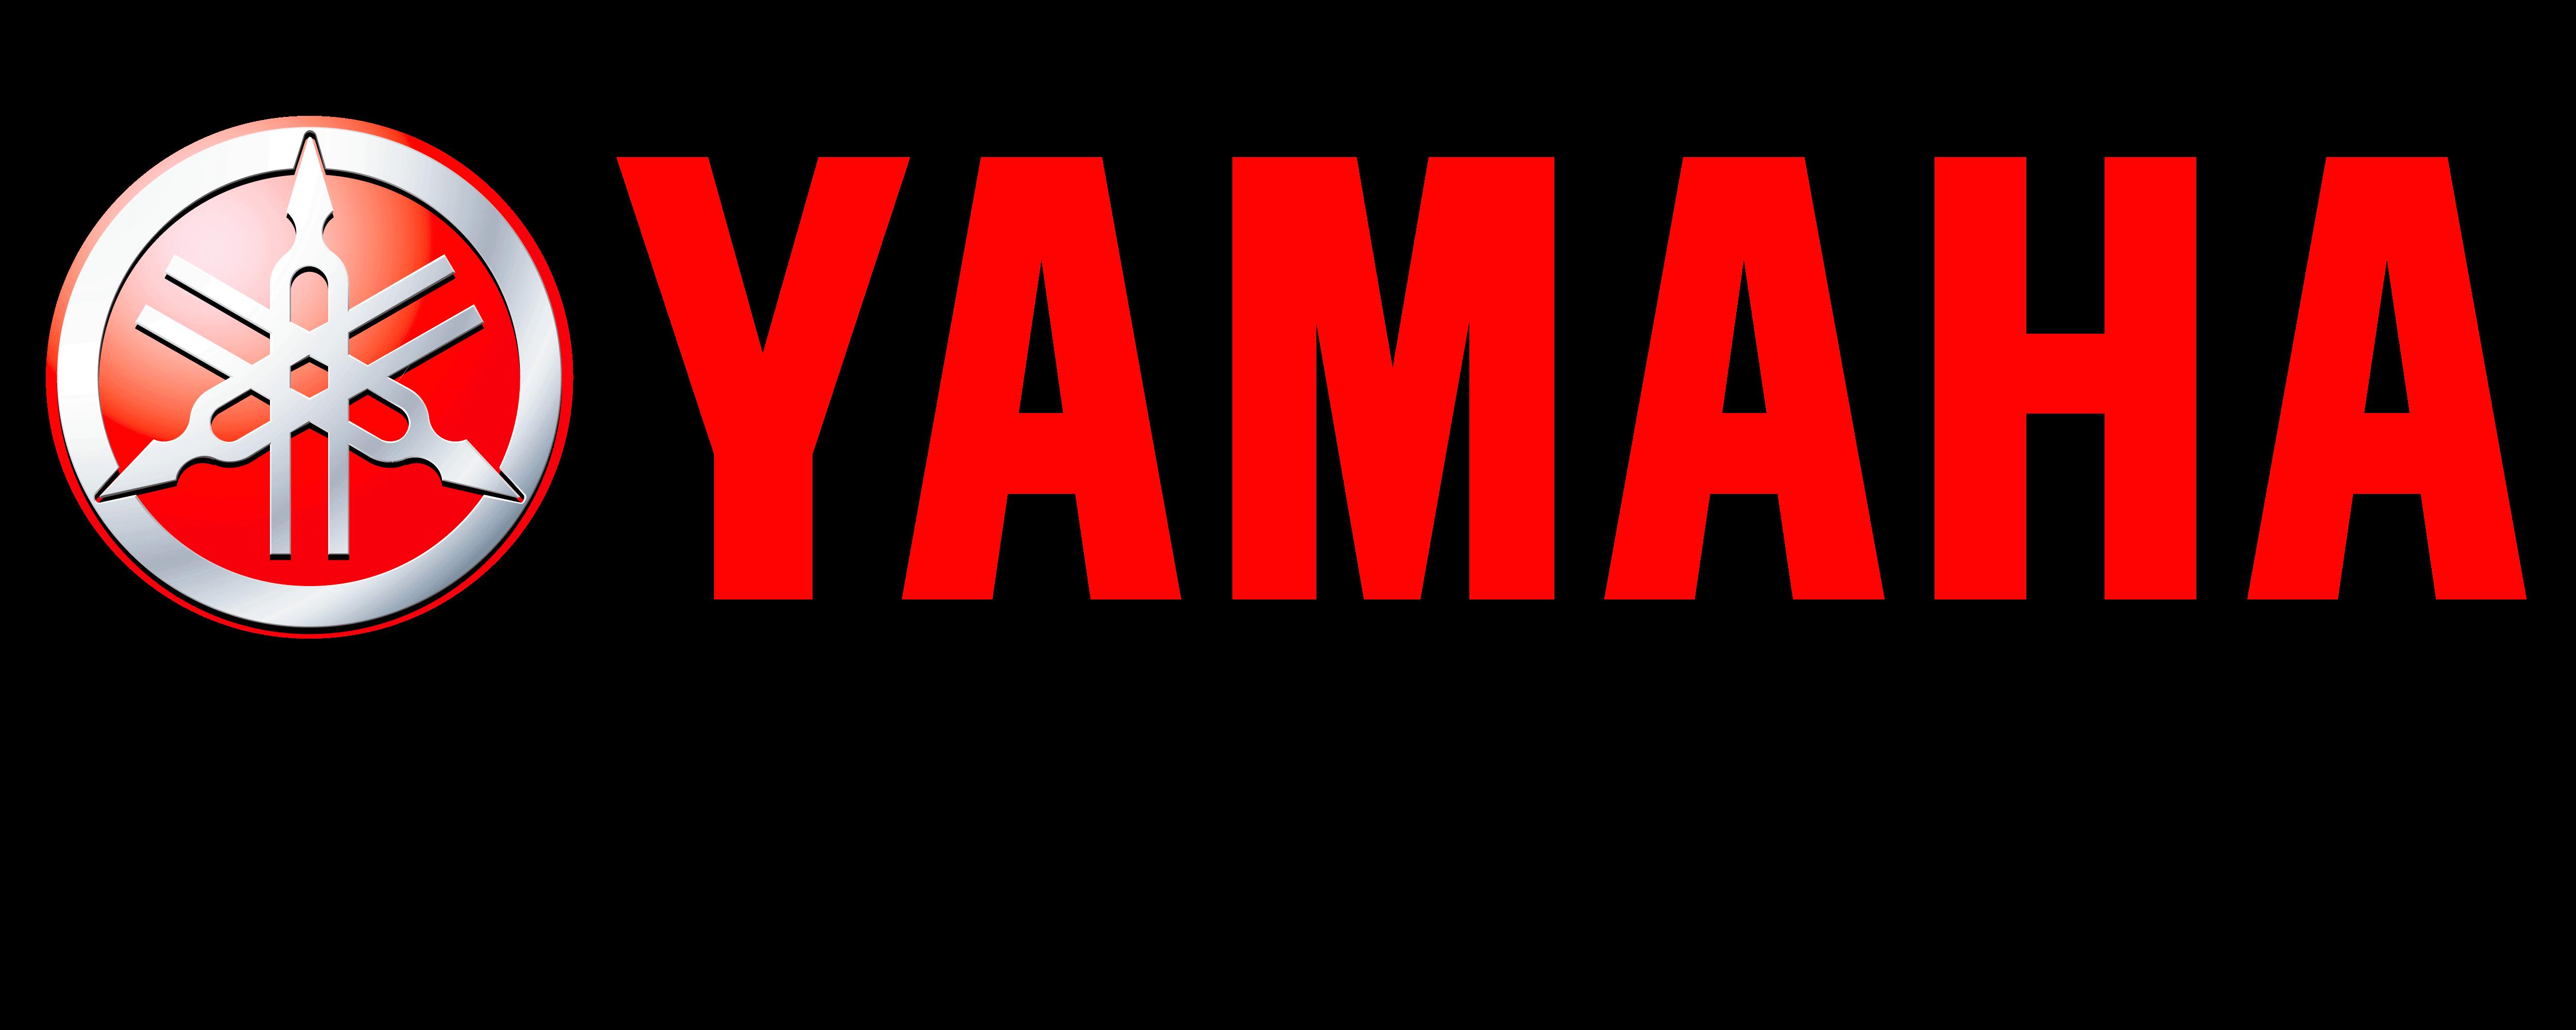 Yamaha-Motorcycles-Logo